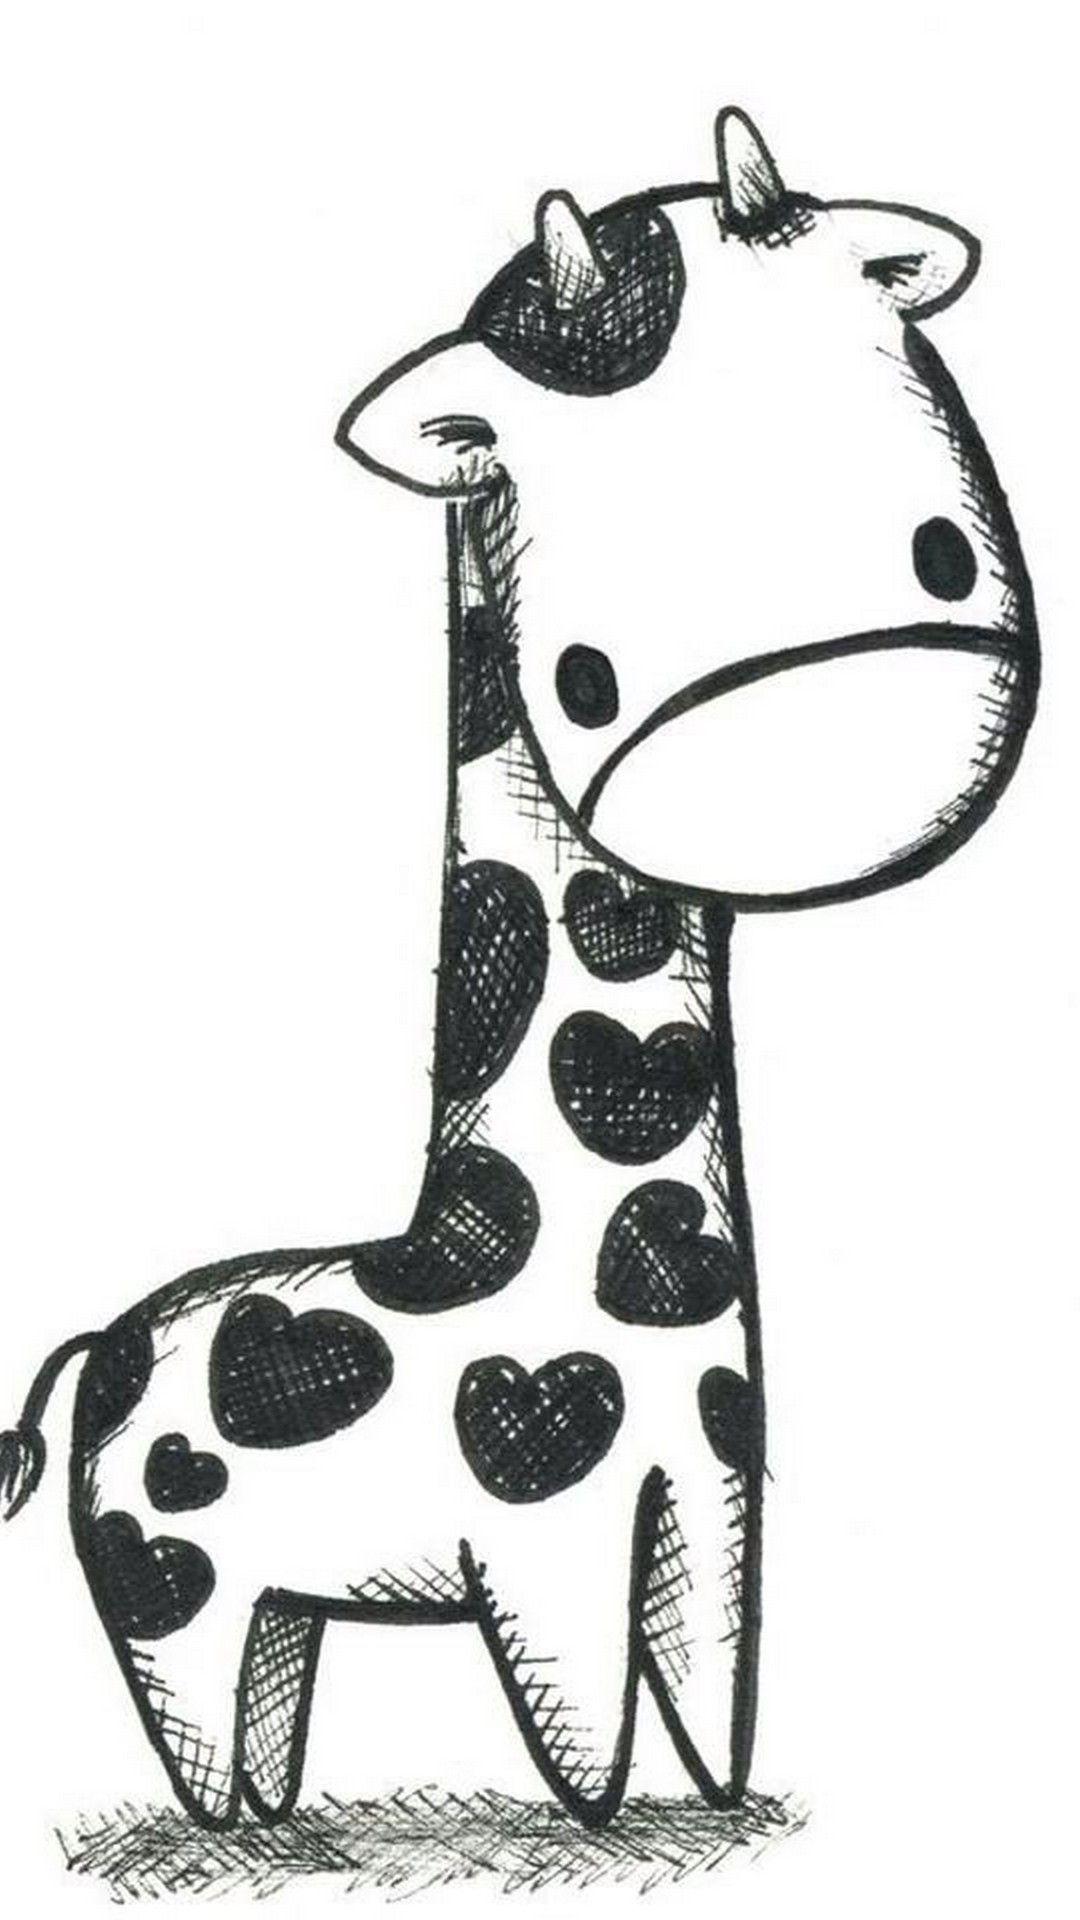 Giraffe Wallpaper Black and White Best iPhone Wallpaper